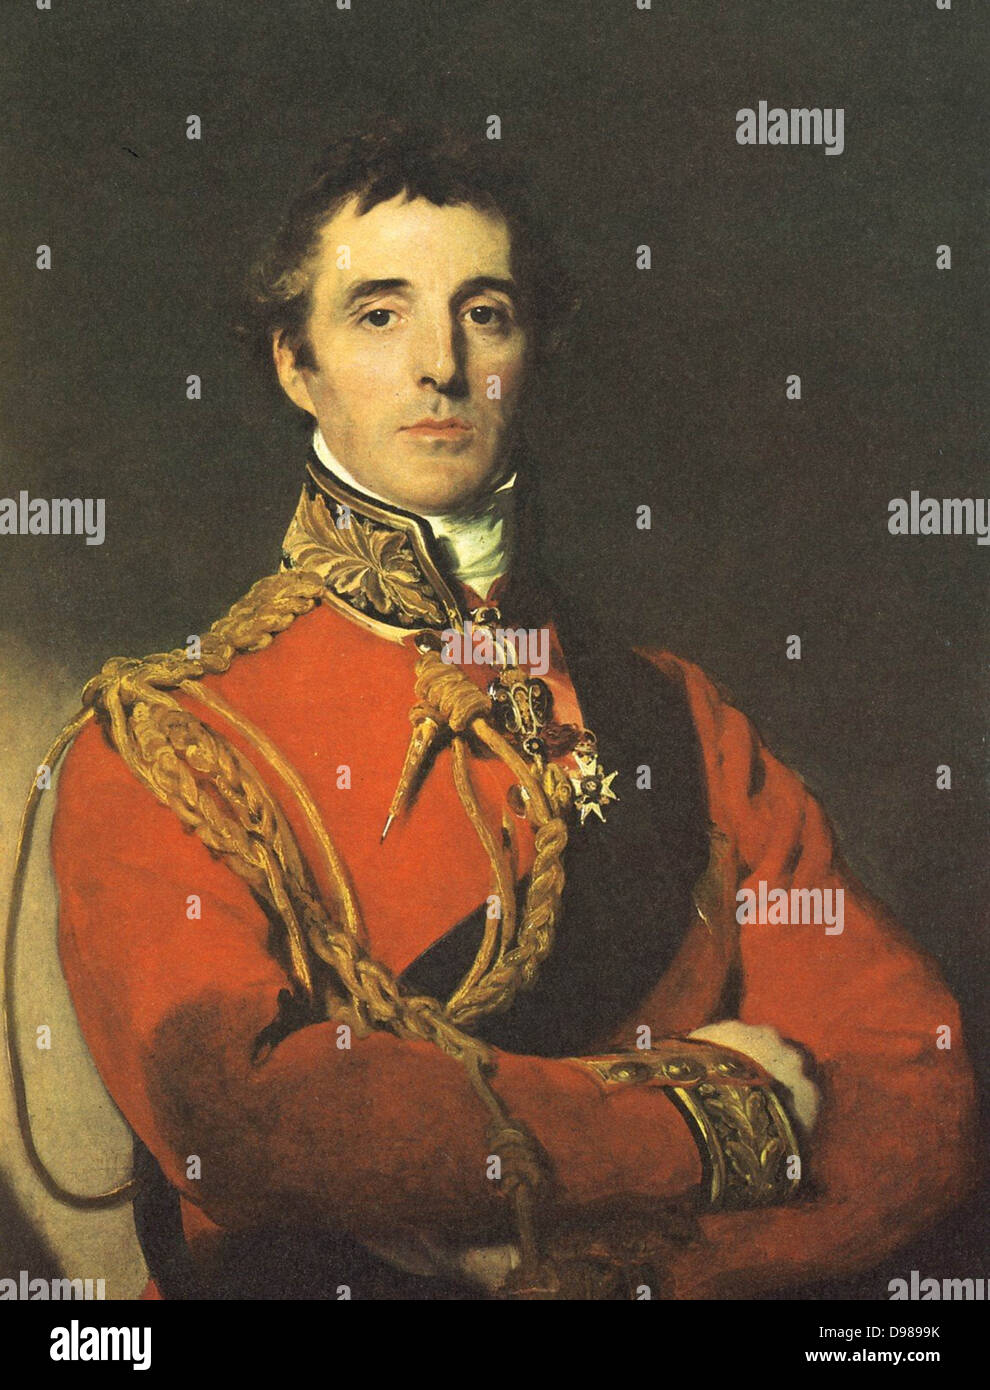 Arthur Wellesley, lst Duke of Wellington (1760-1852) Anglo-Irish soldier and statesman. British Prime Minister 1827. - Stock Image